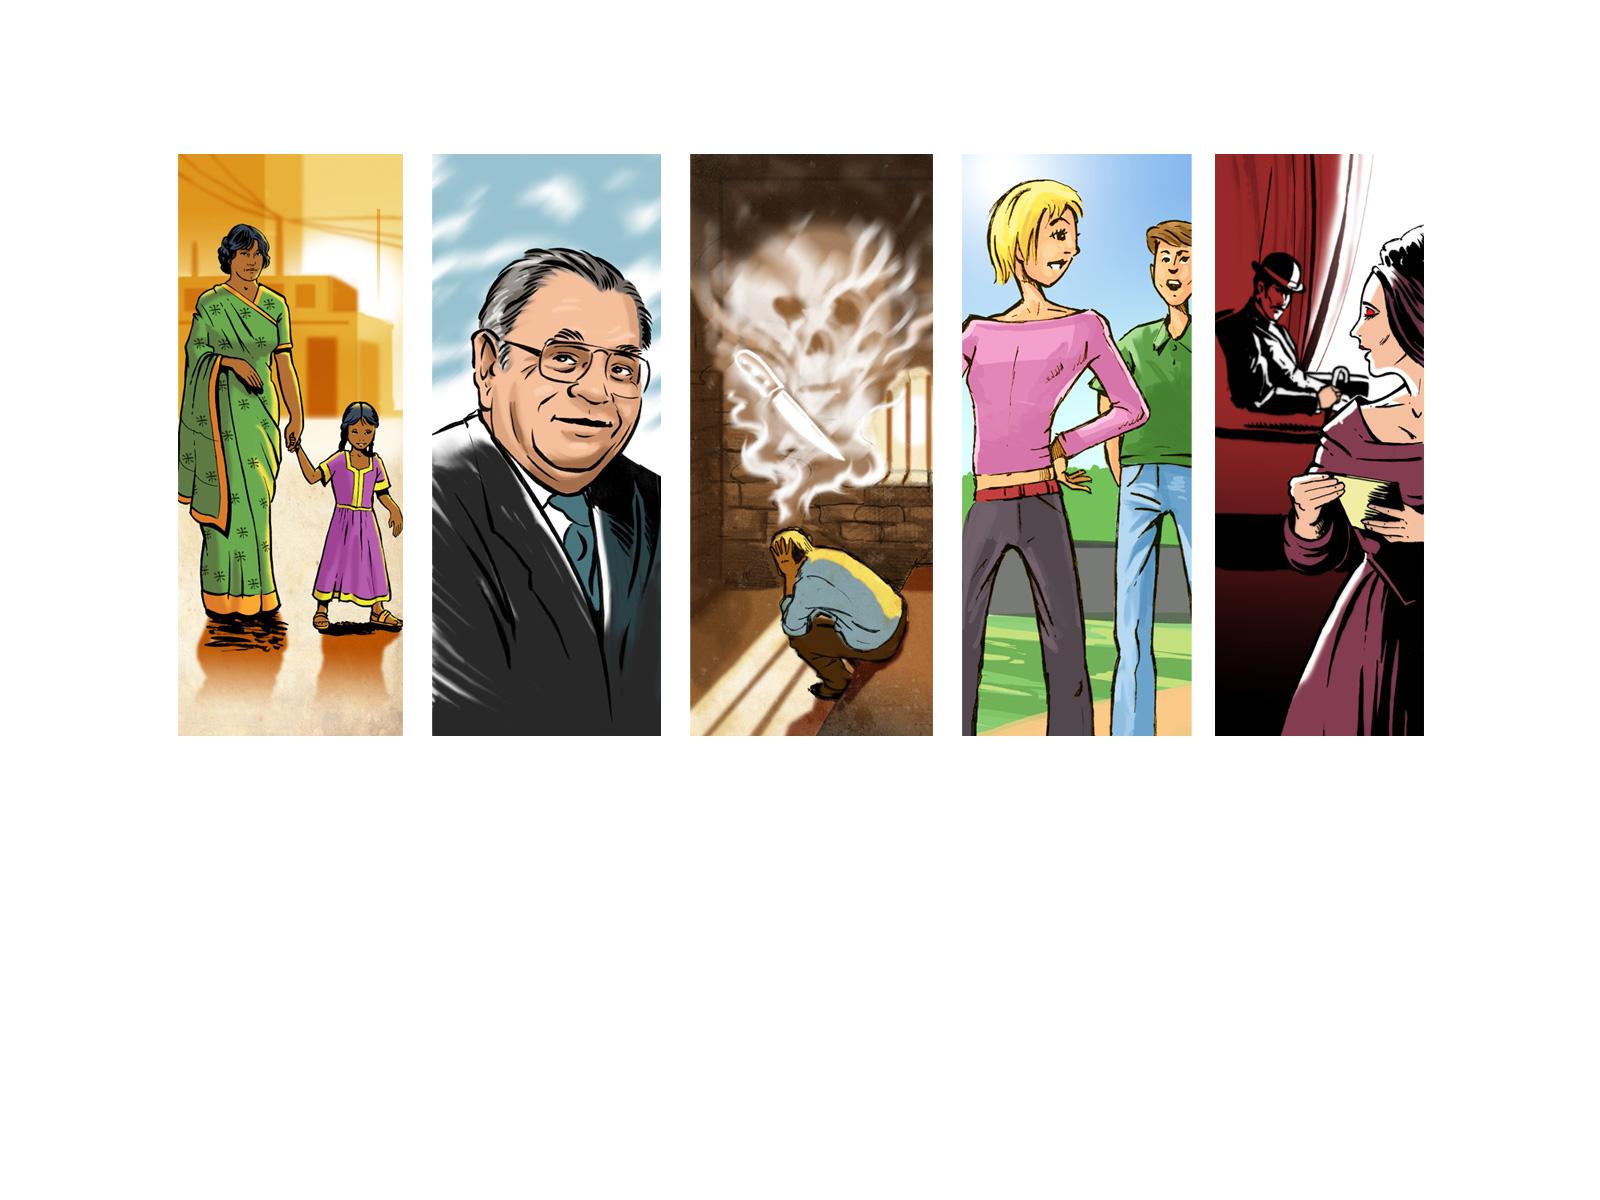 VANDEELENFred-Illustrations-EDITIONS-3653